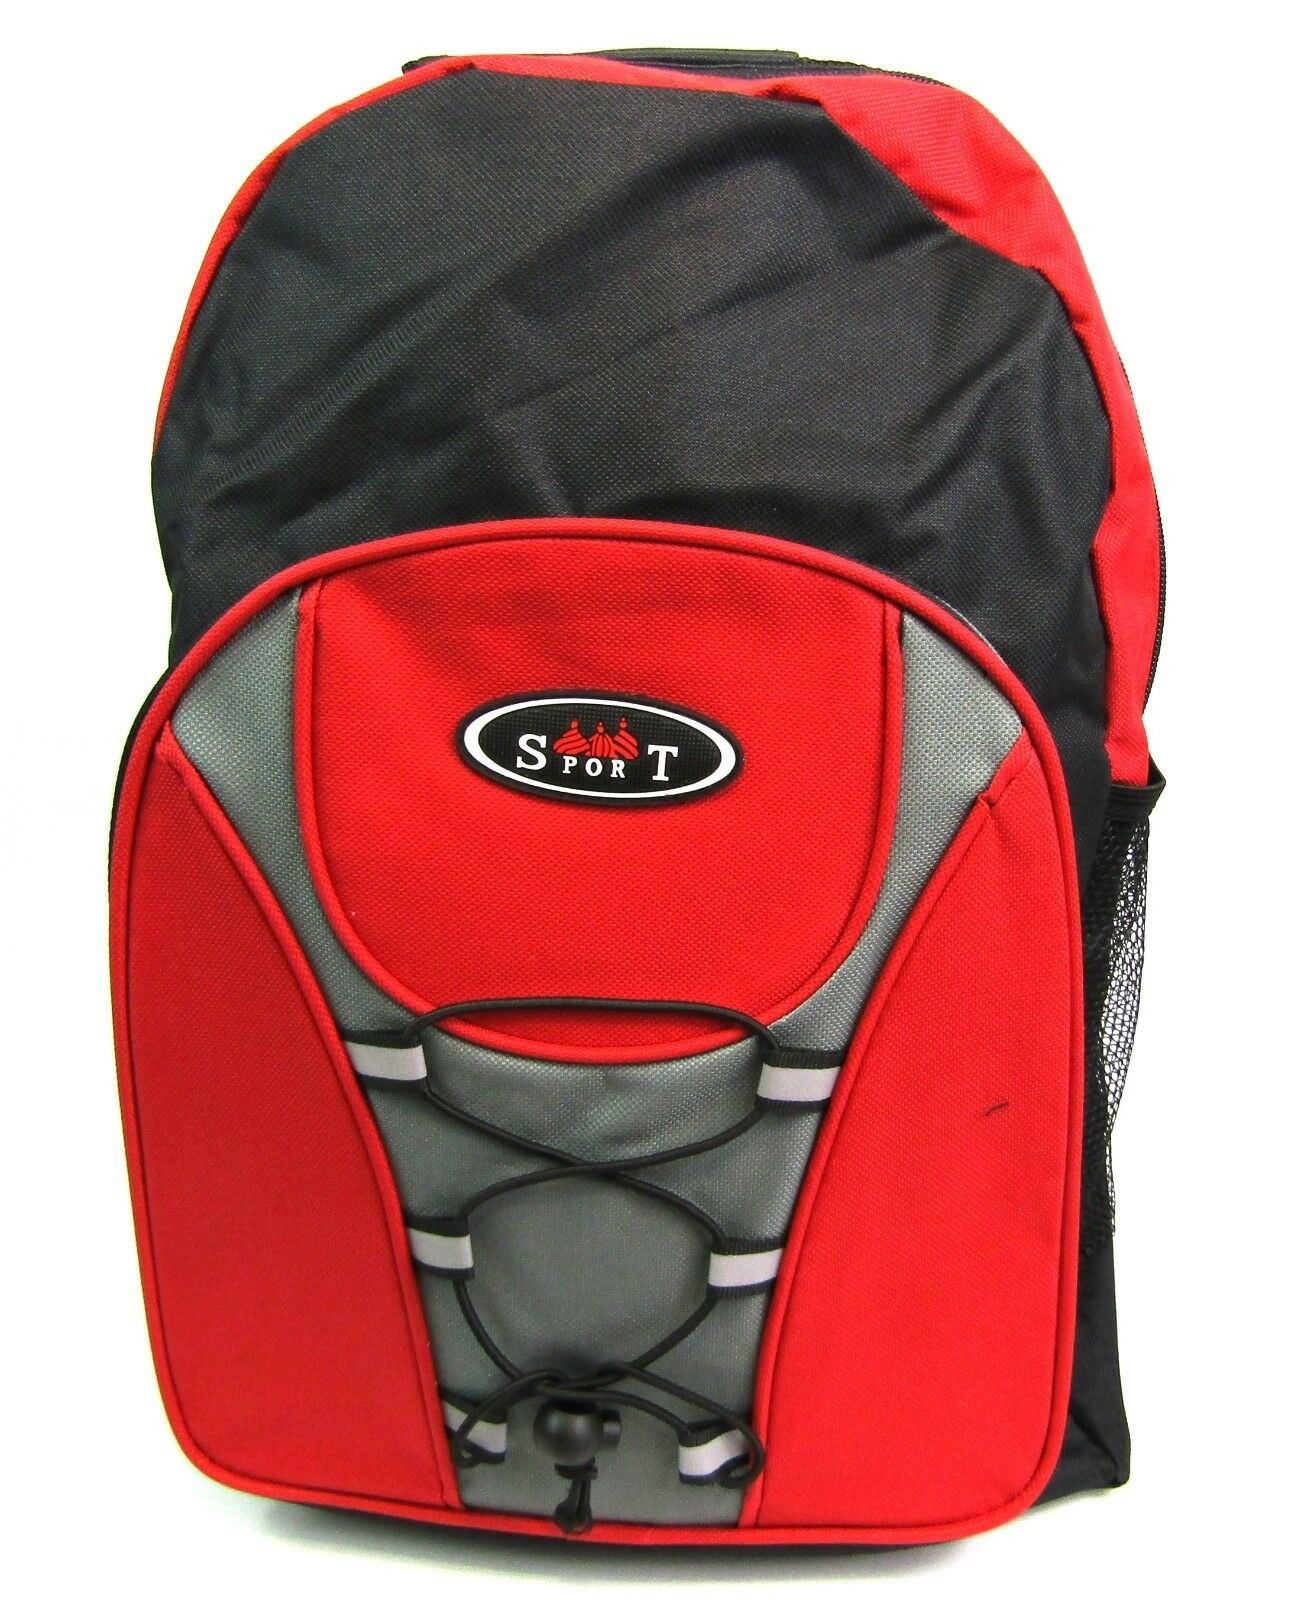 Light Weight Travel School Holiday Hiking Rucksack Bag Shoulder Handbag Satchel